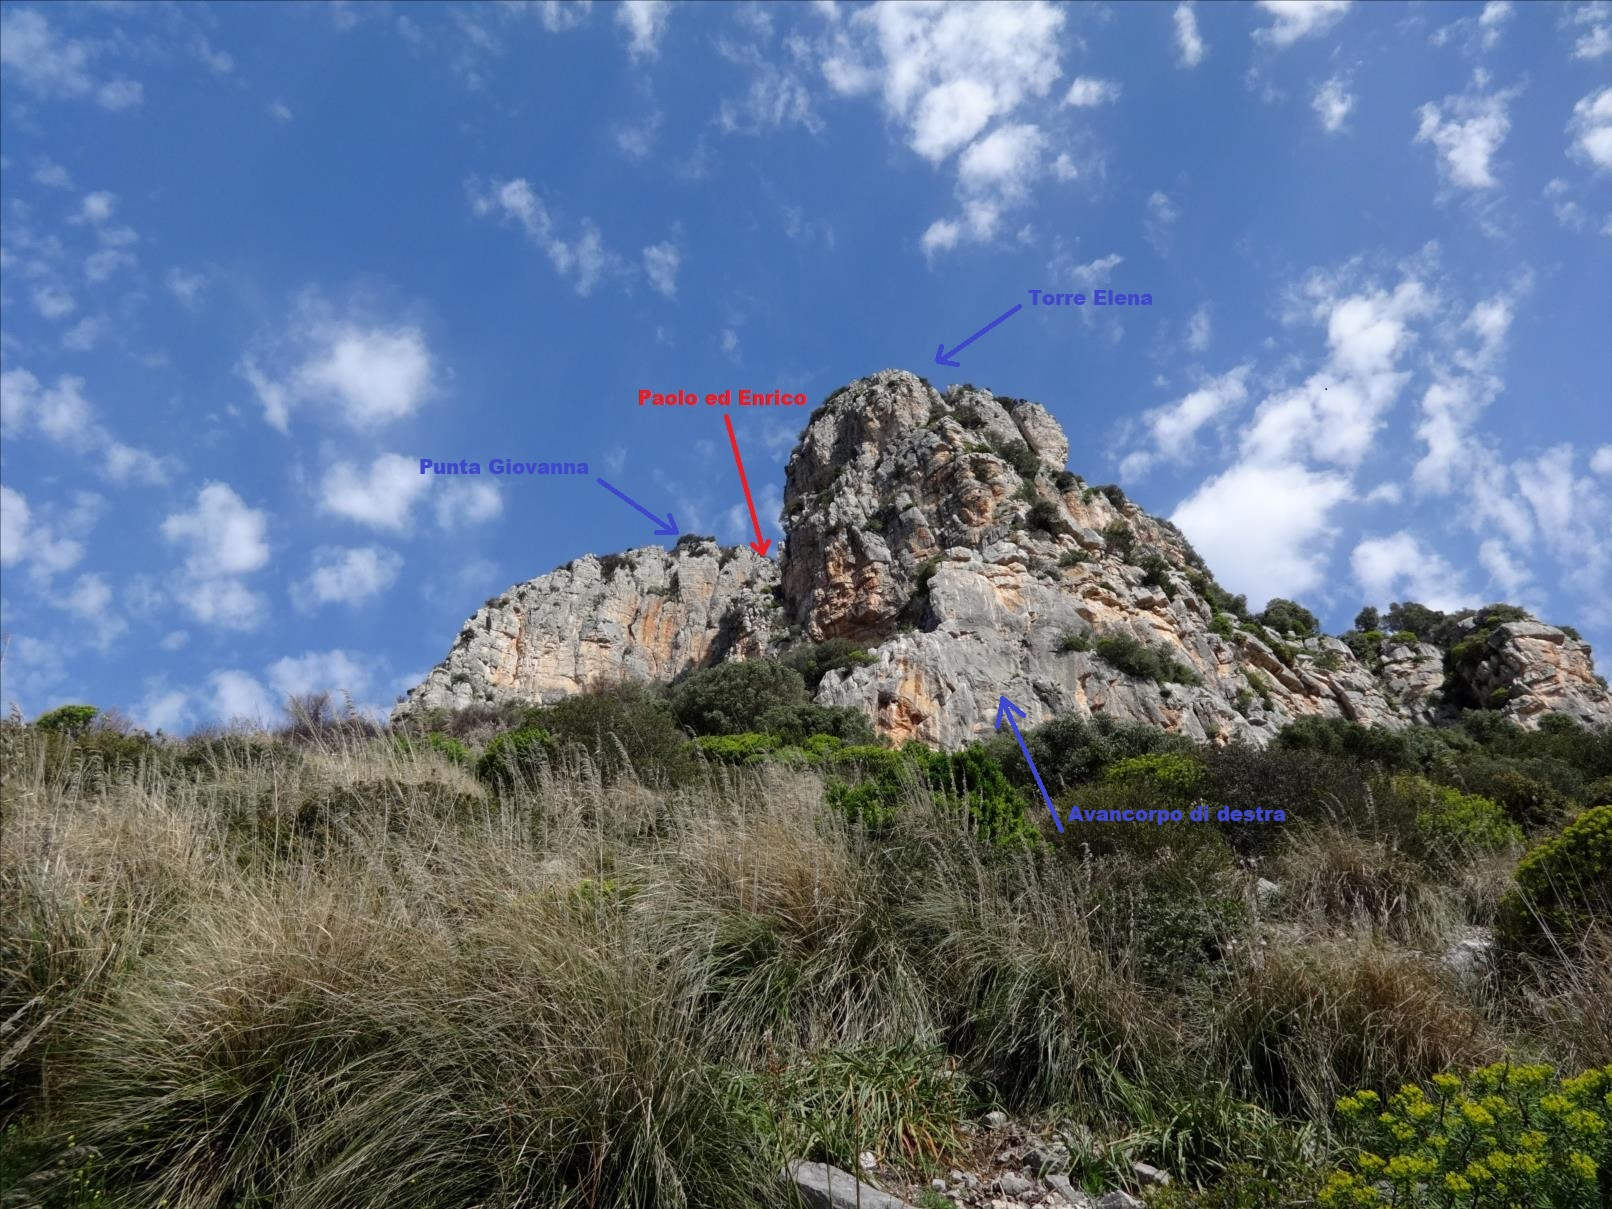 Montagne de Leano, voie Paolo ed Enrica, Latium (Italie)